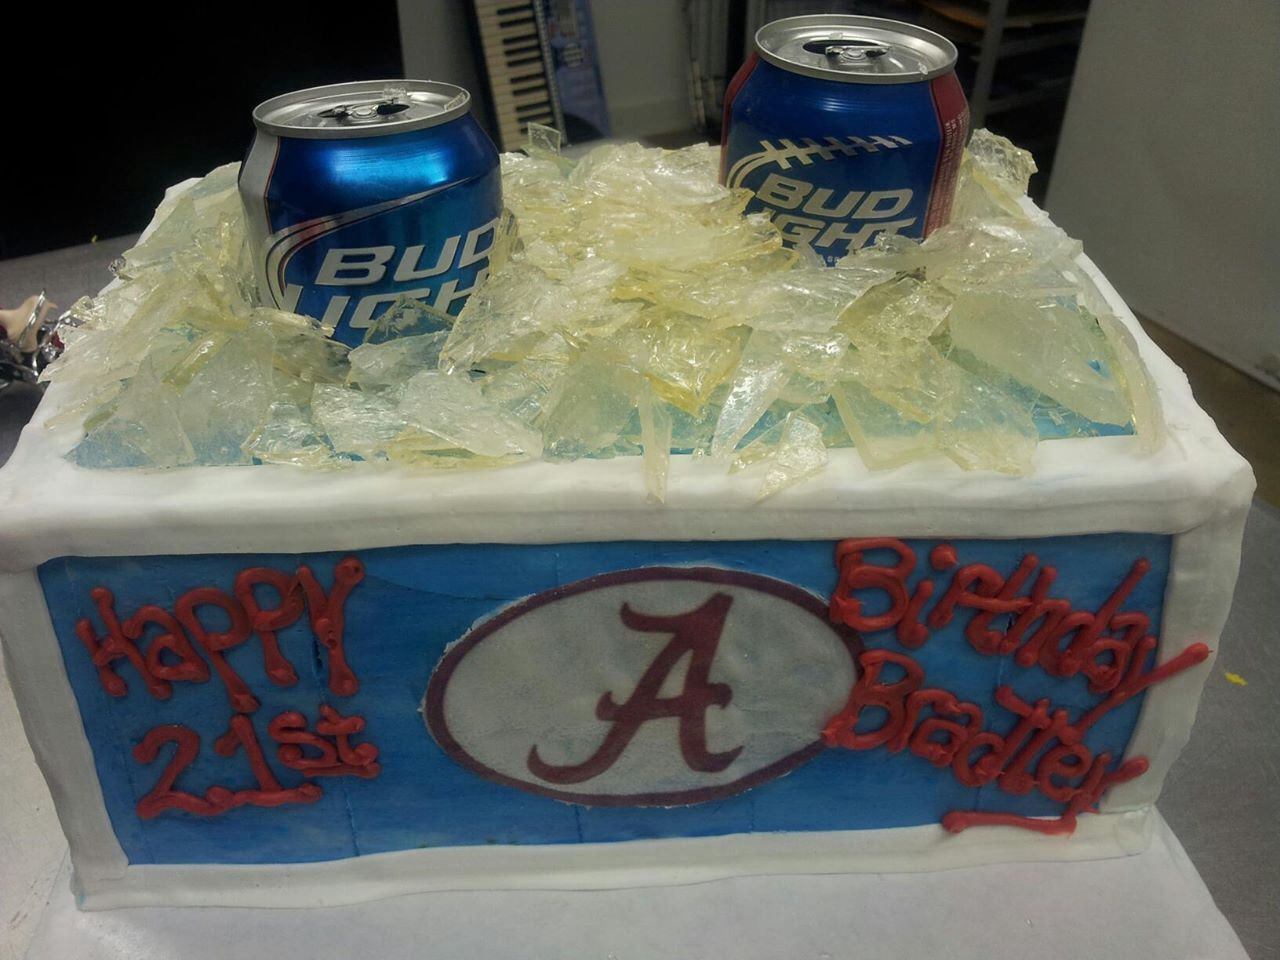 Alabama crimson tide cool box cake with beer cool box